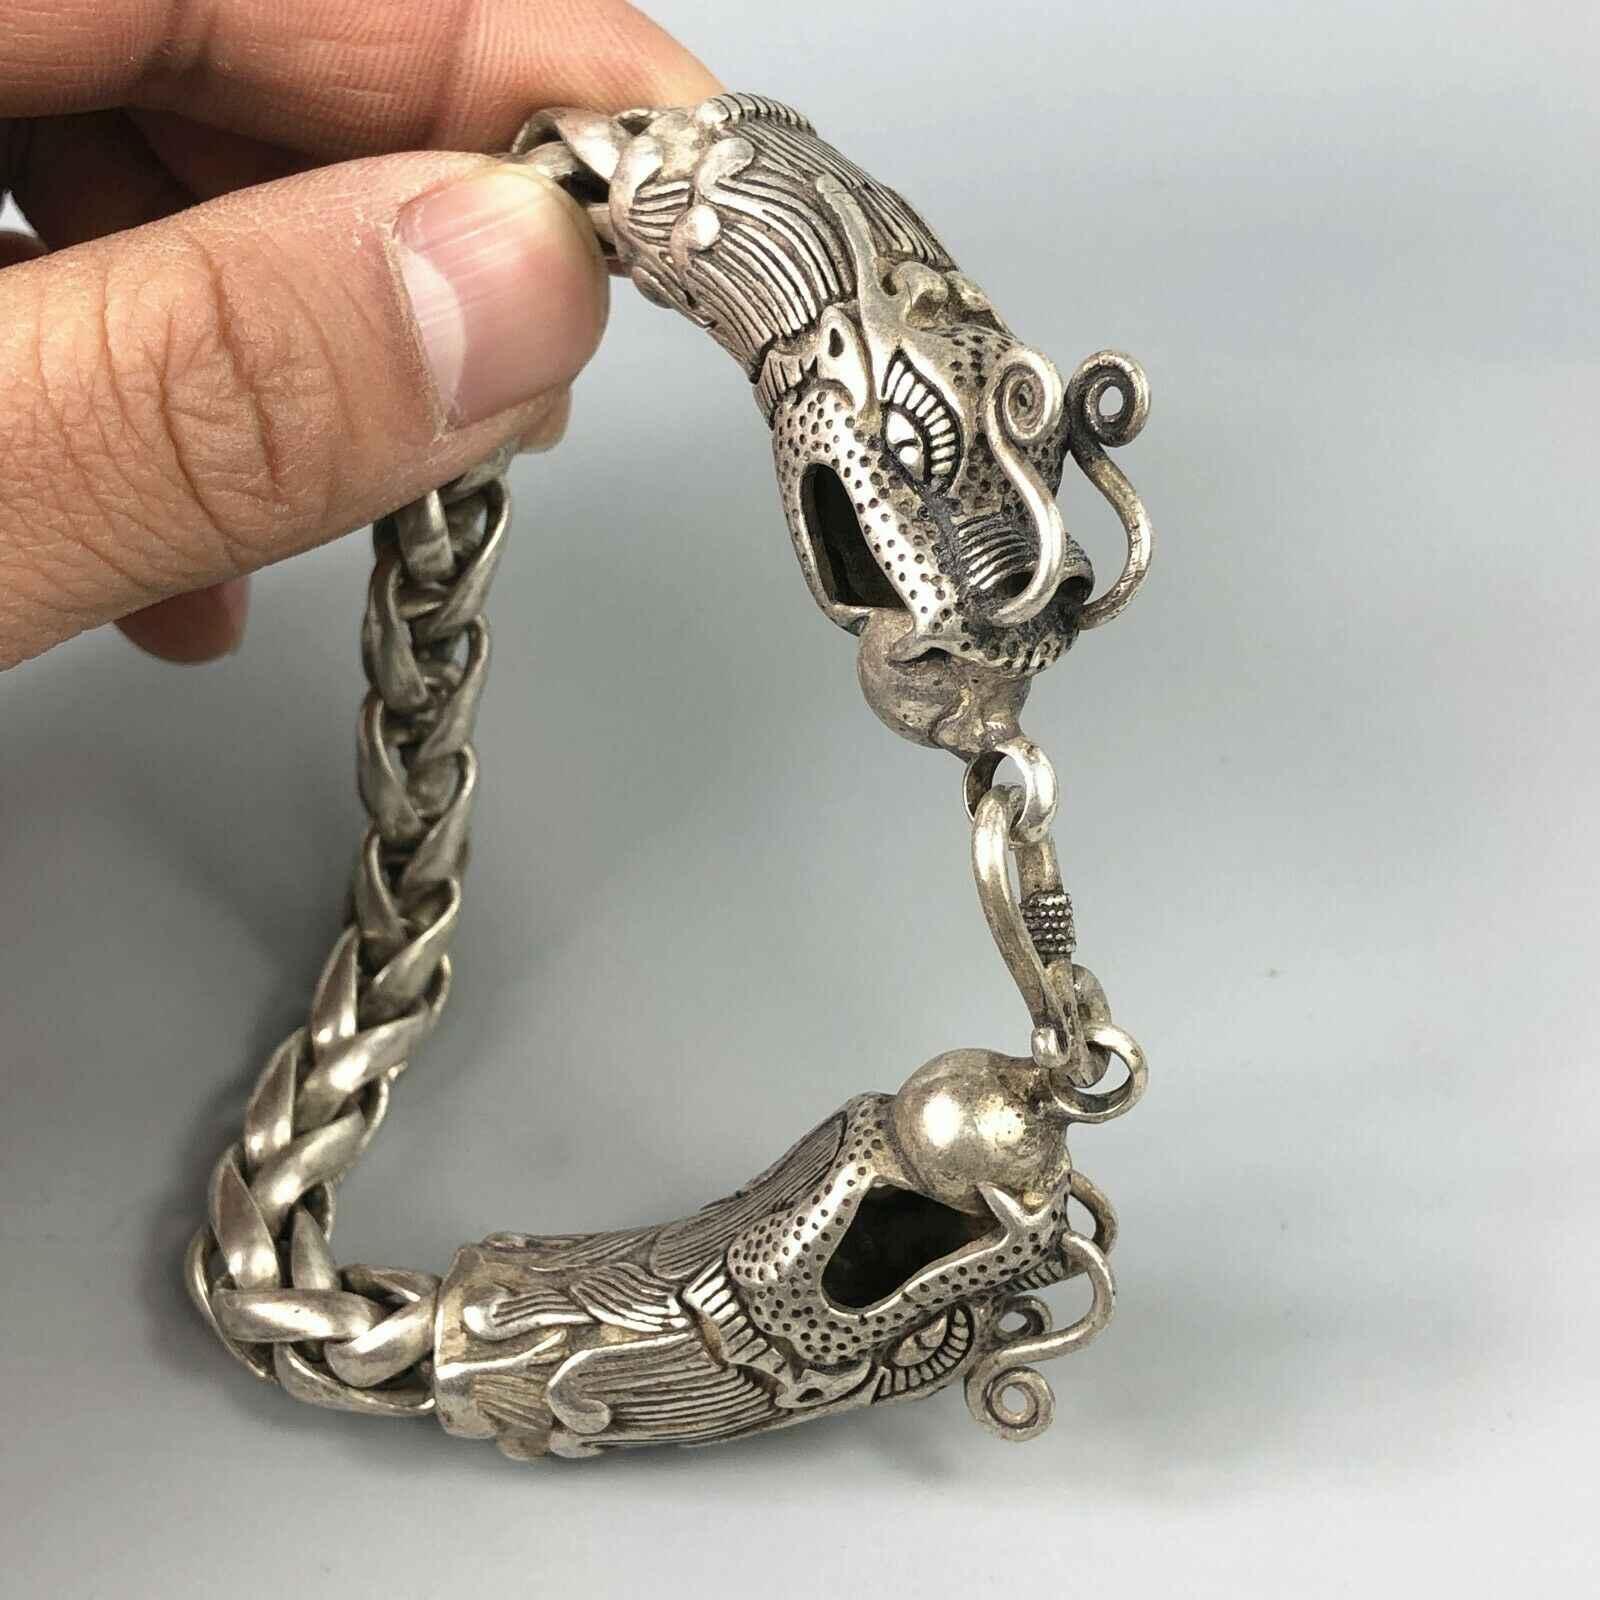 Rare China tibet silver Guan Yin Goddess Buddha Dragon Bullion thanka amulet